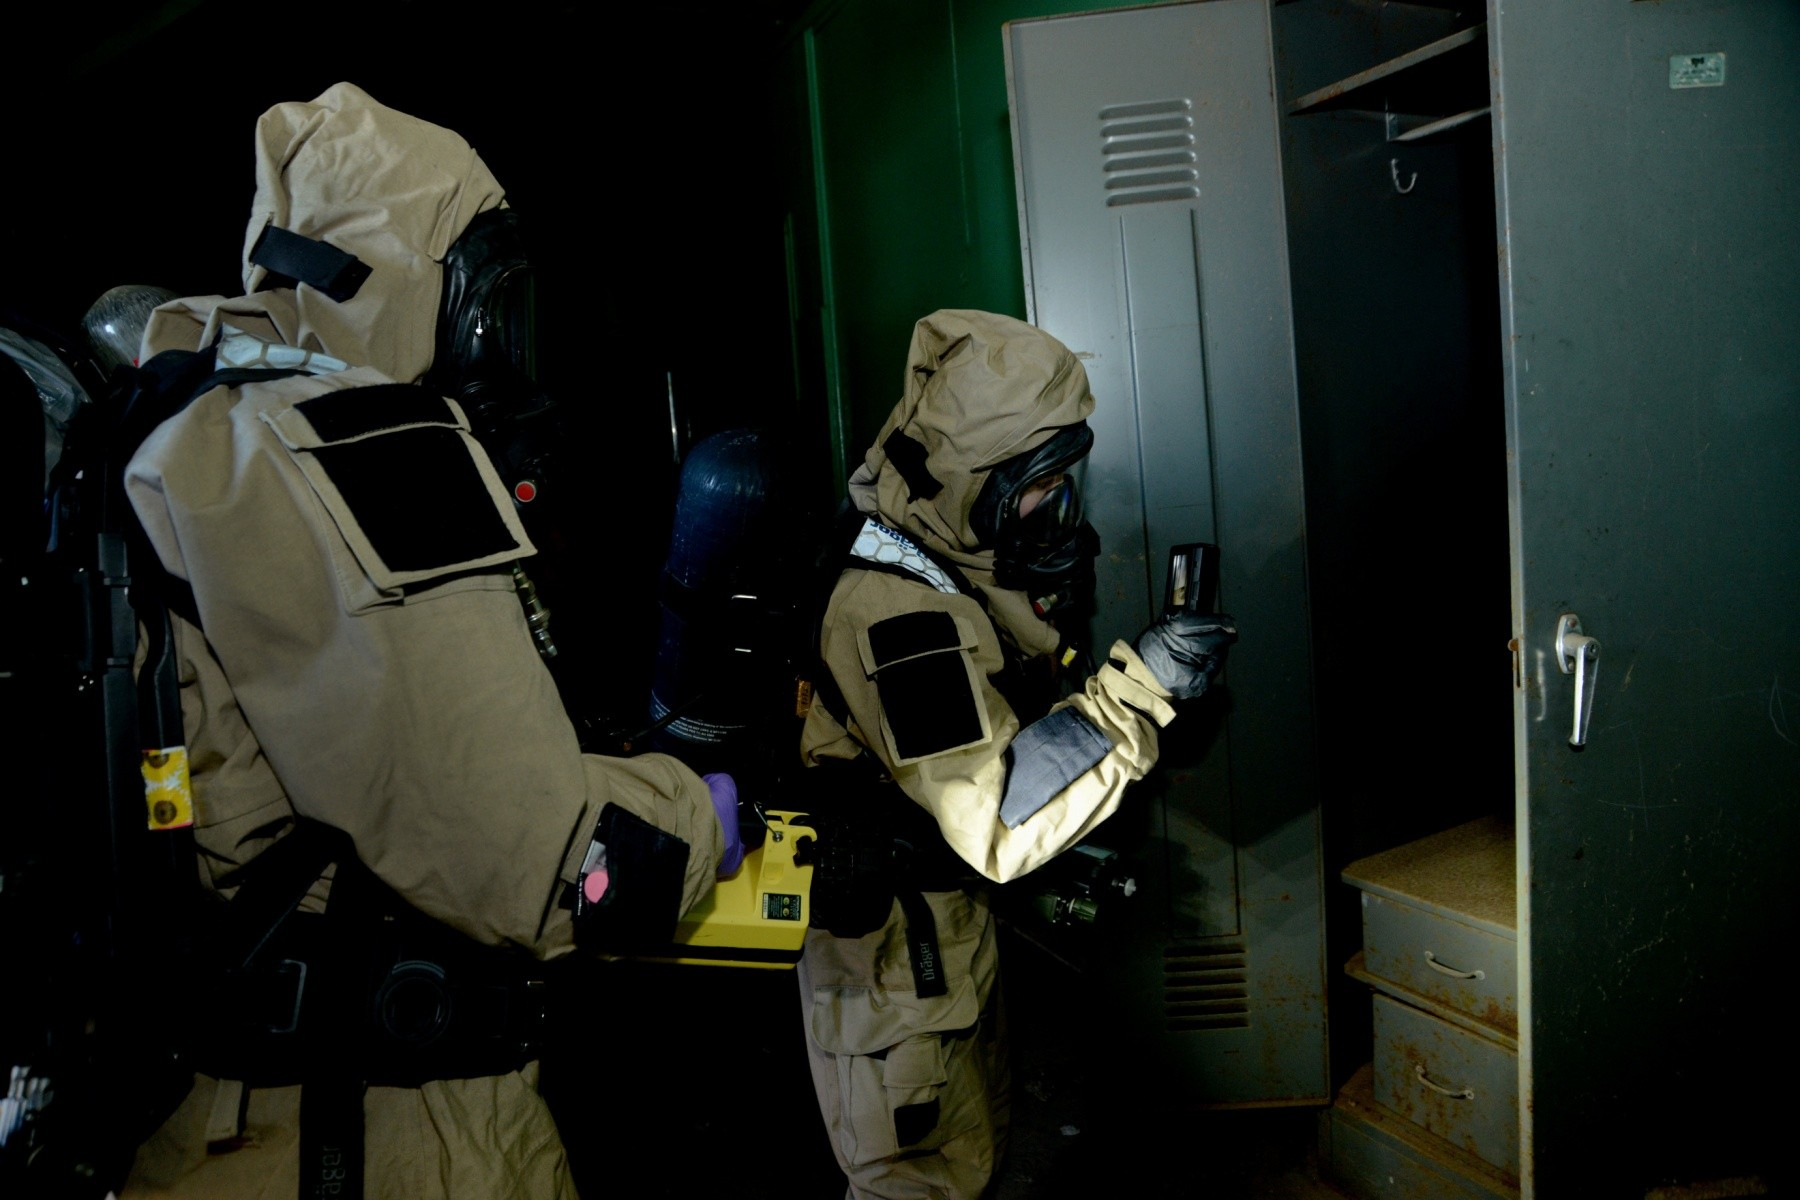 National Guardsmen confront chemical attacks during Bay ...